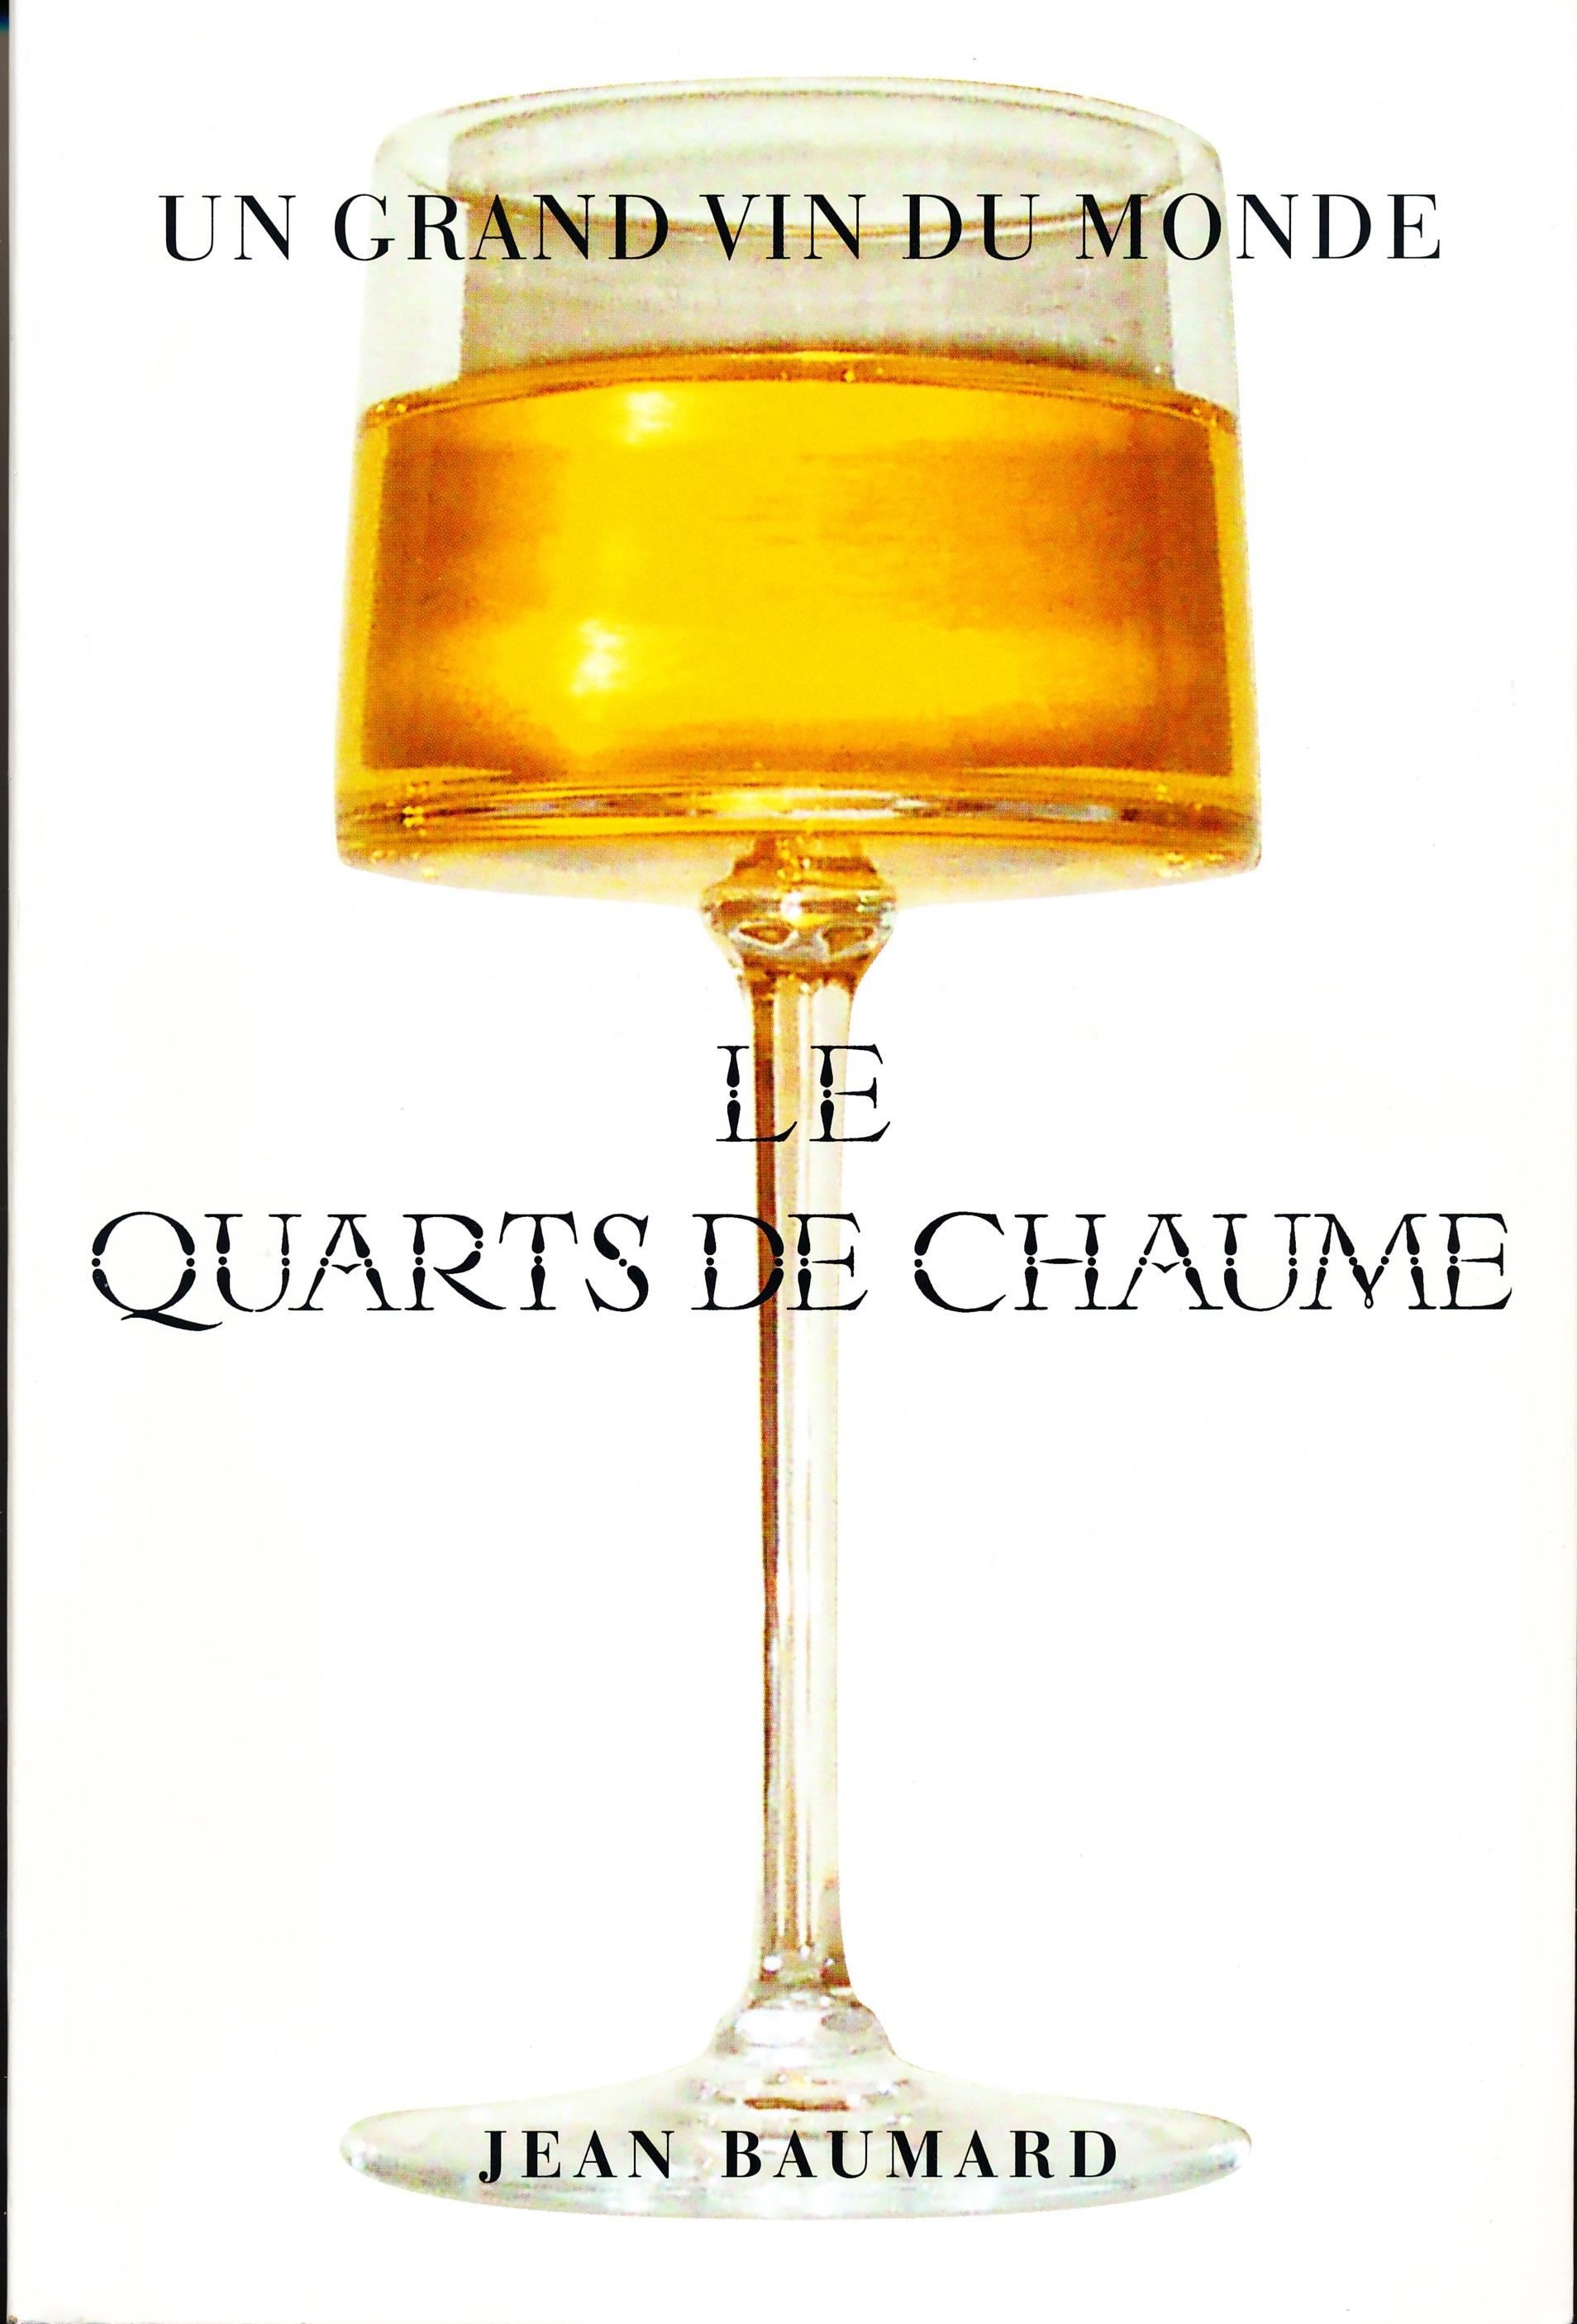 JB-QuartsdeChaume_0001